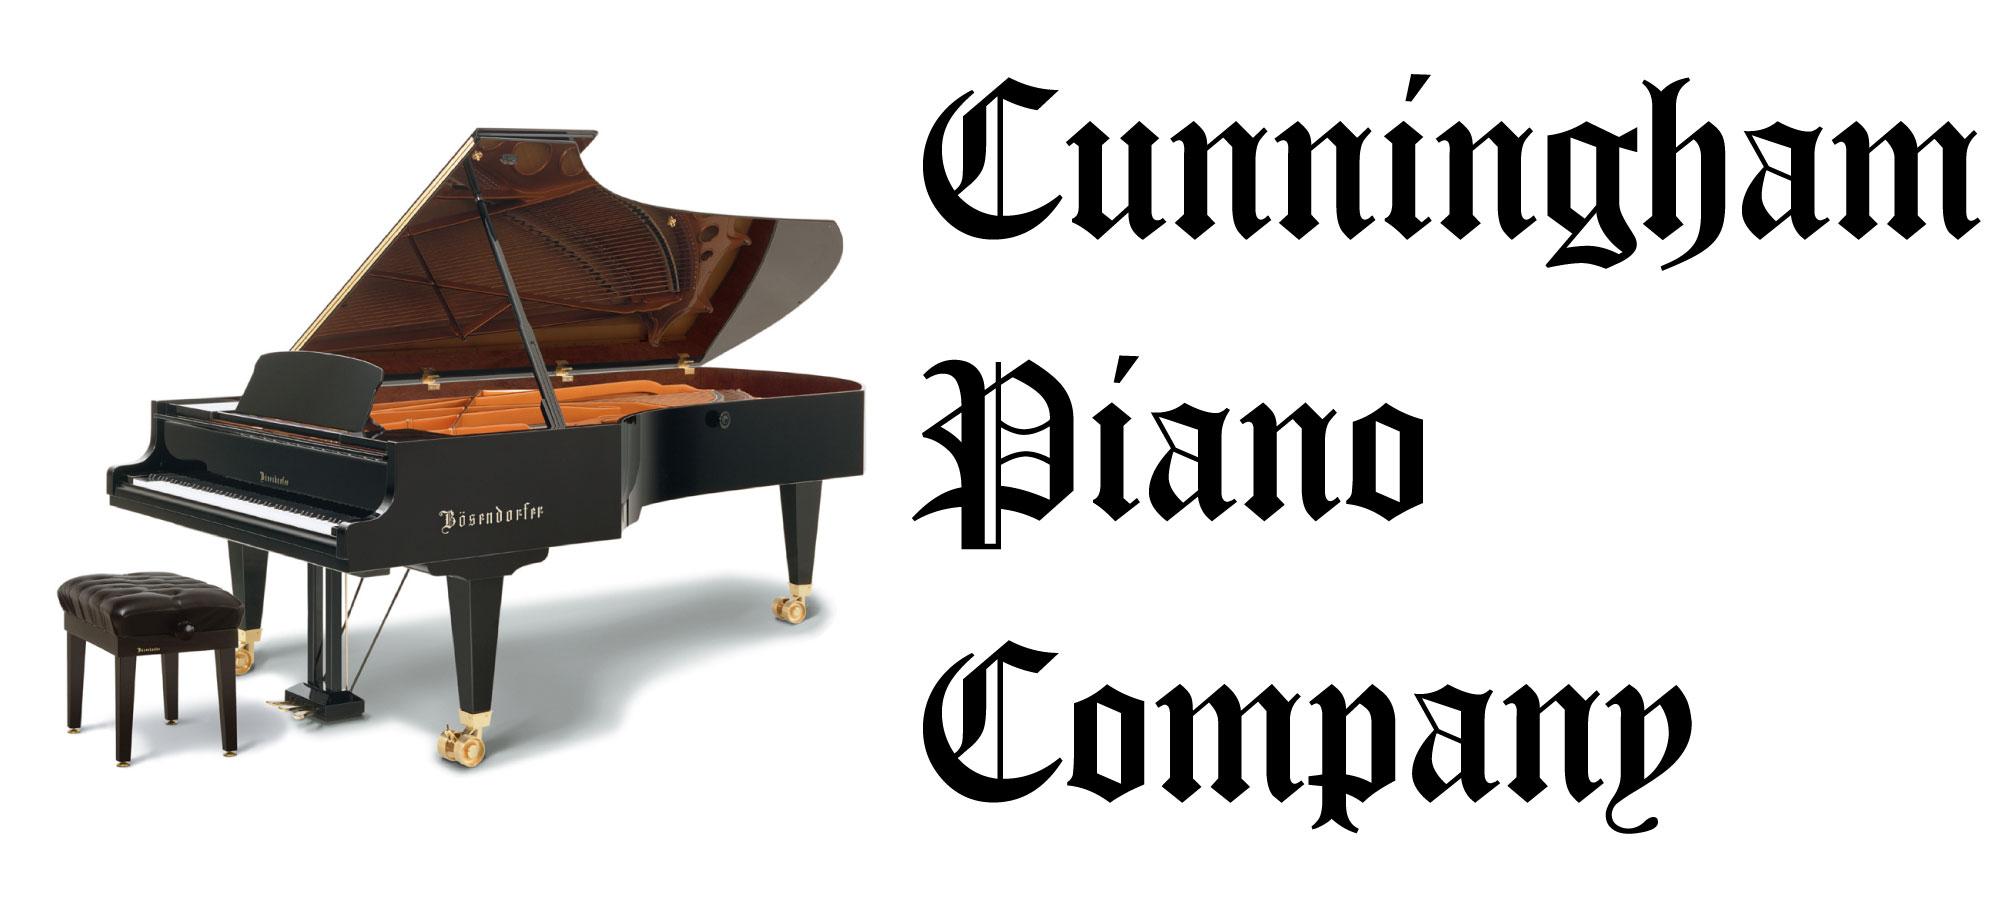 Cunningham-Piano-Logo-rectangle2000.jpg